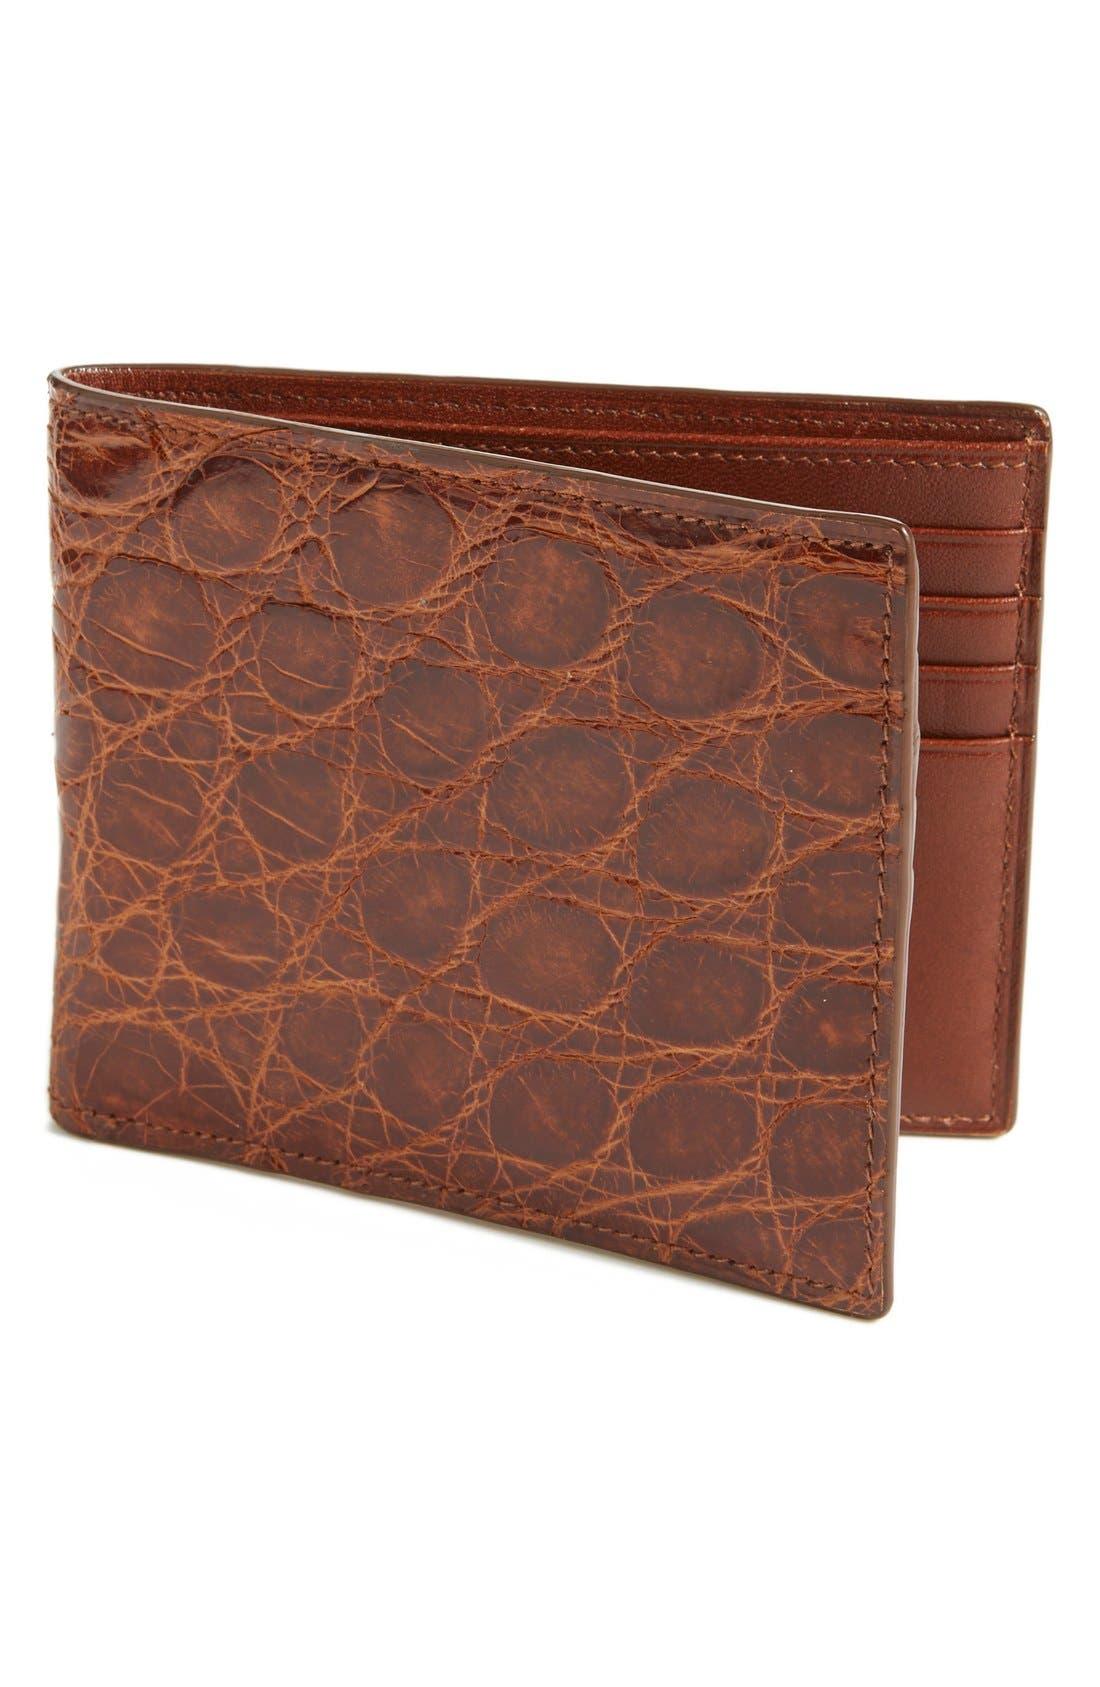 Glazed Genuine Crocodile Wallet,                             Main thumbnail 1, color,                             215